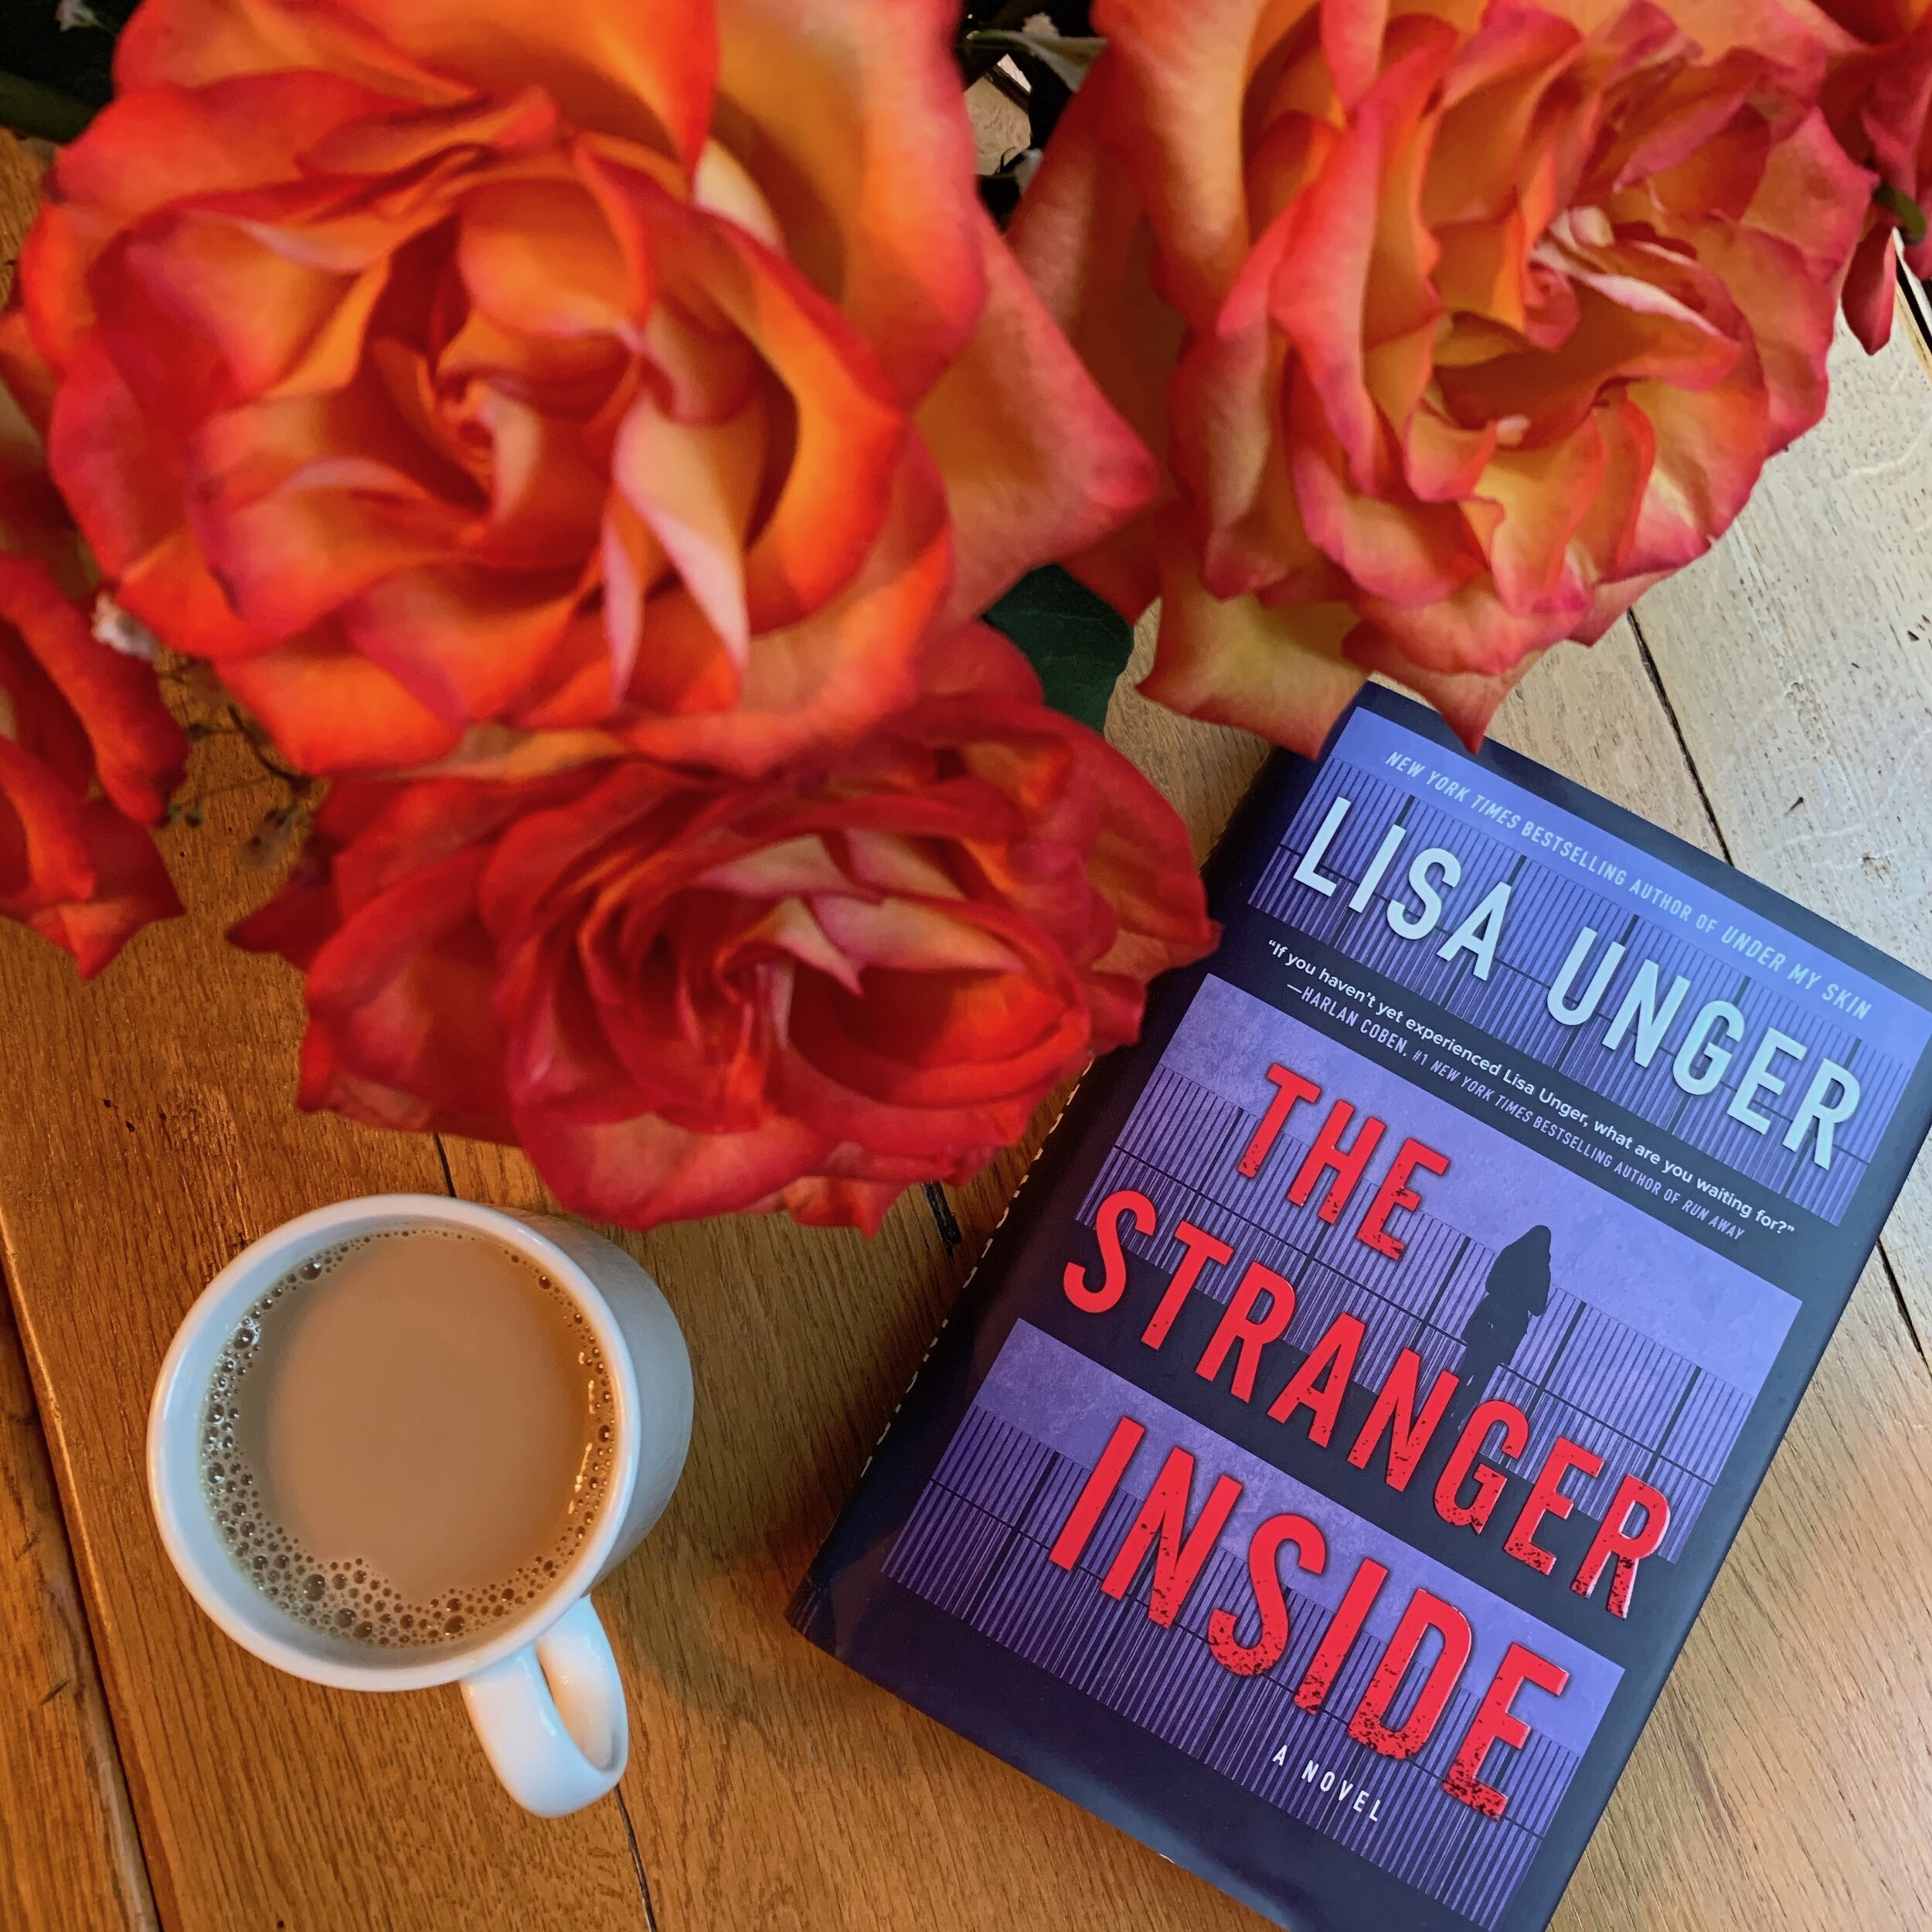 ** Book Review for THE STRANGER INSIDE by Lisa Unger  **